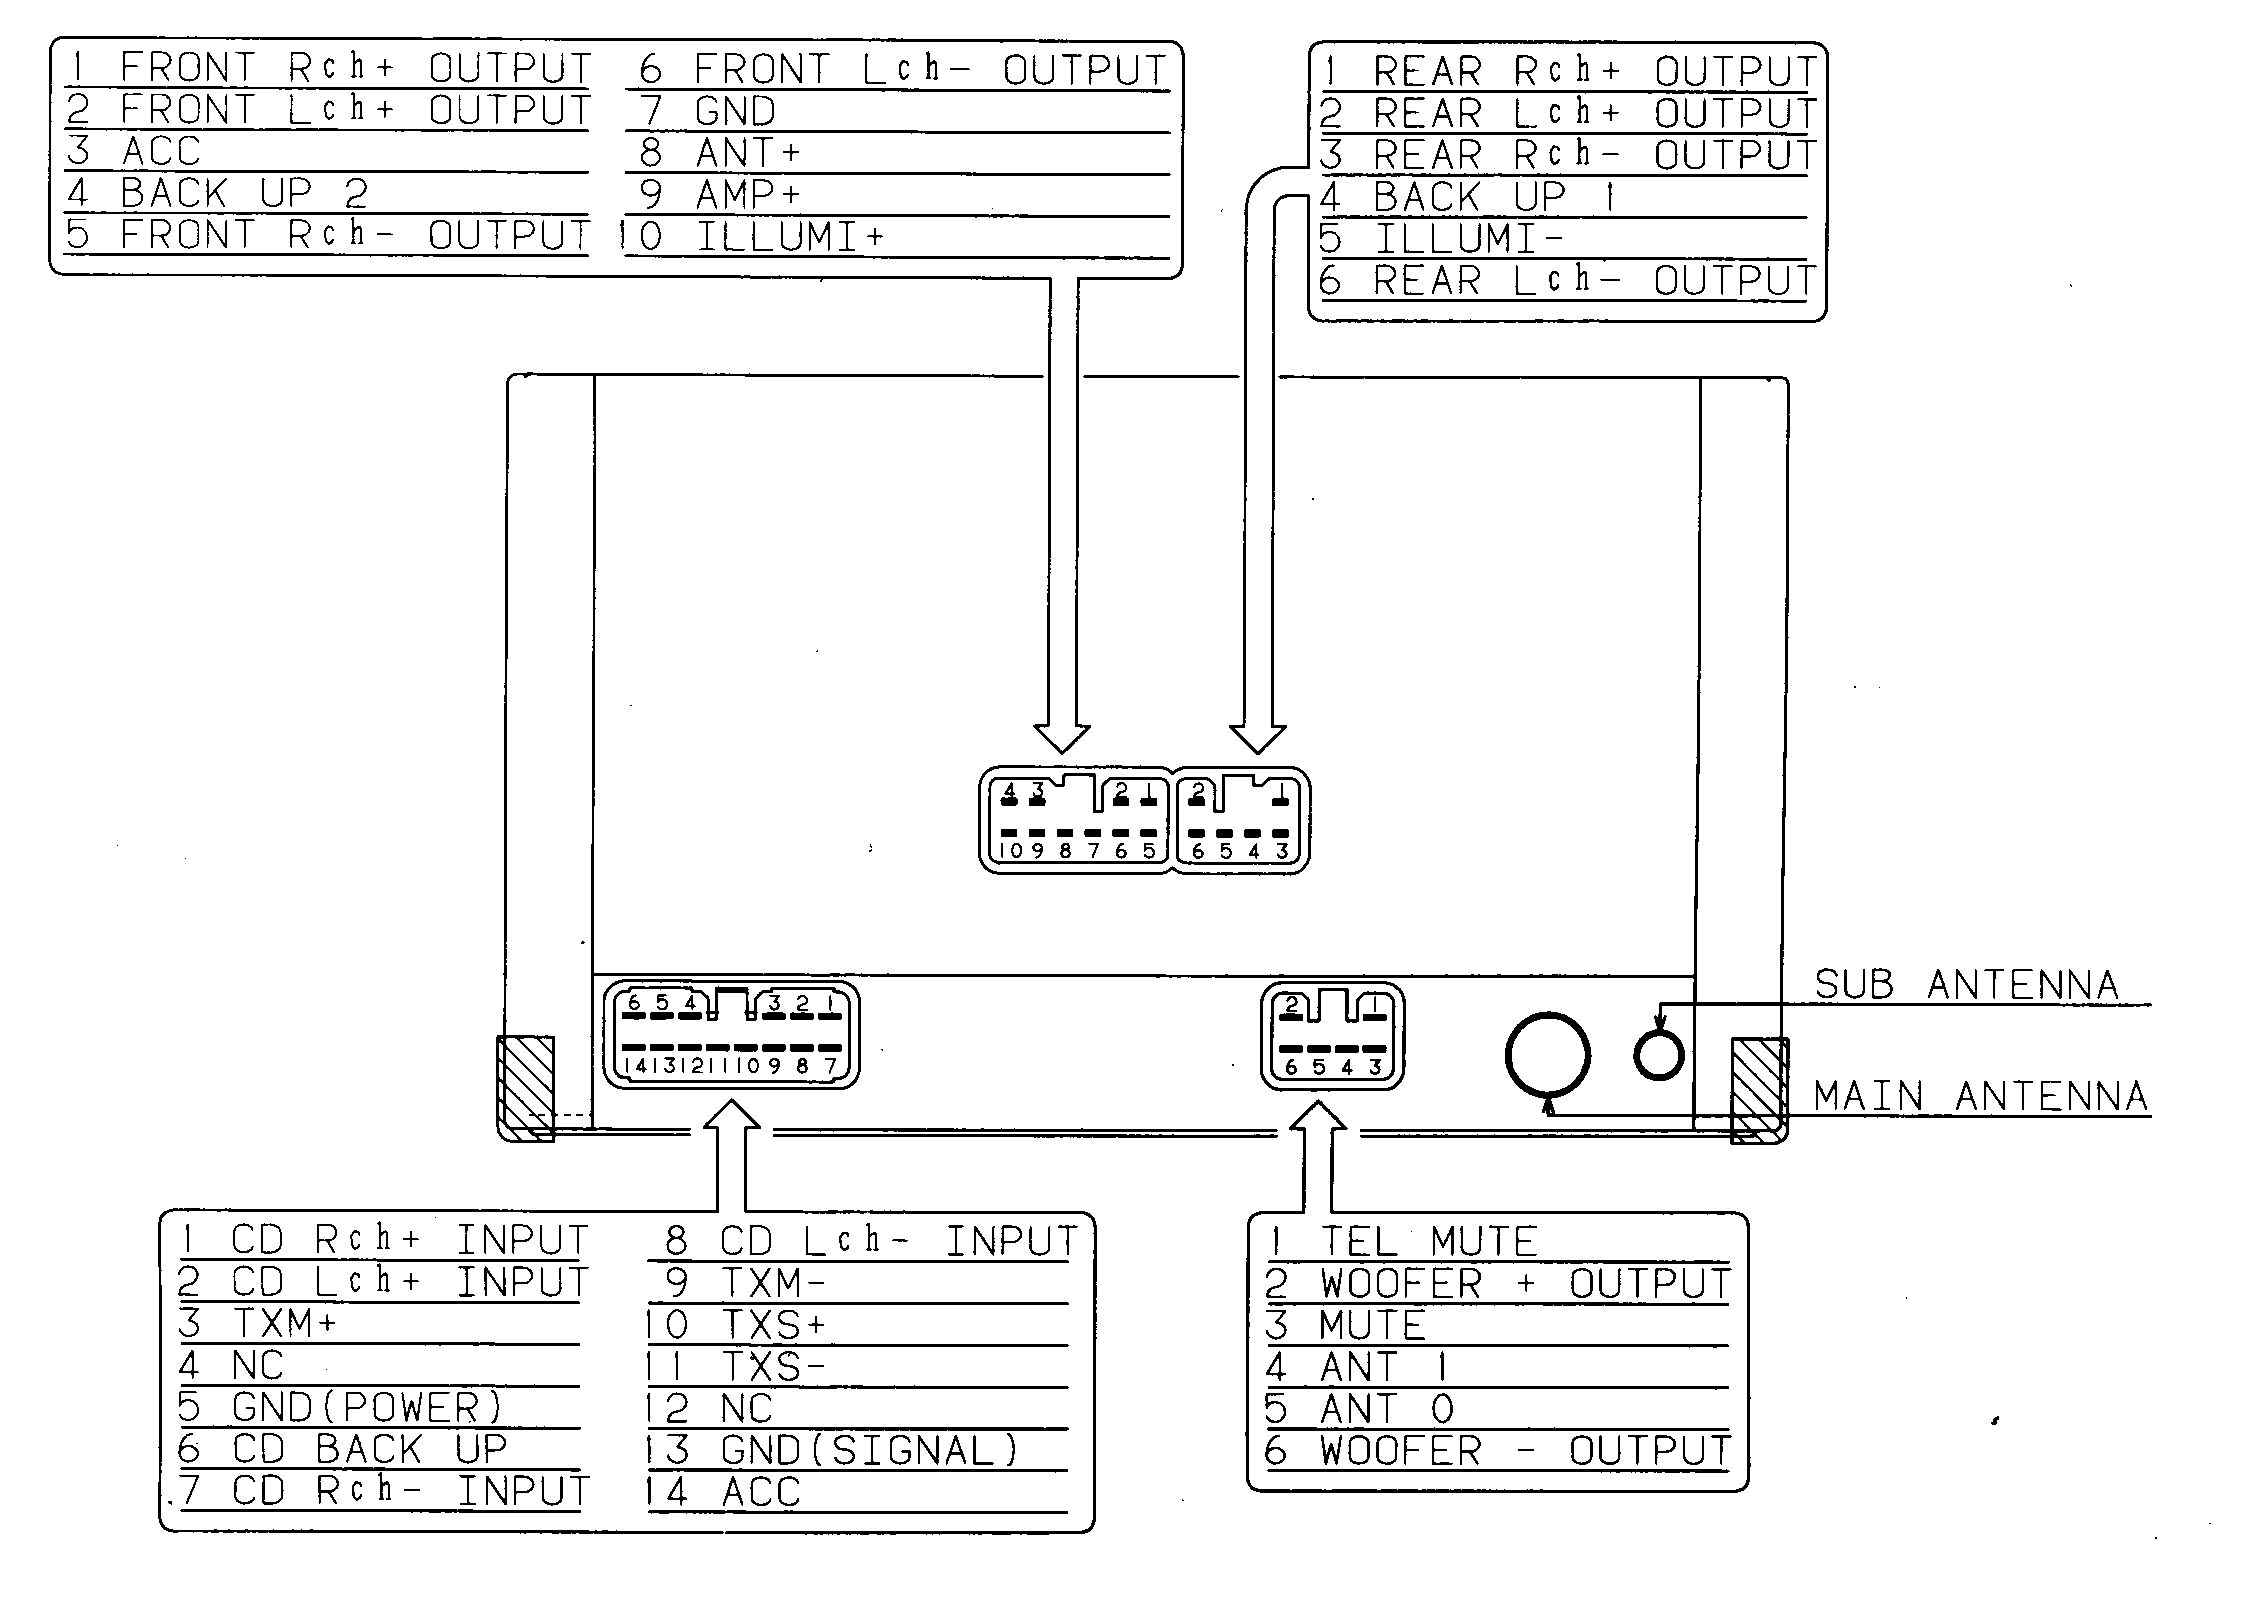 Lexus Es300 Wiring Diagram - 2015 Ford Focus Wiring Diagram for Wiring  Diagram SchematicsWiring Diagram Schematics